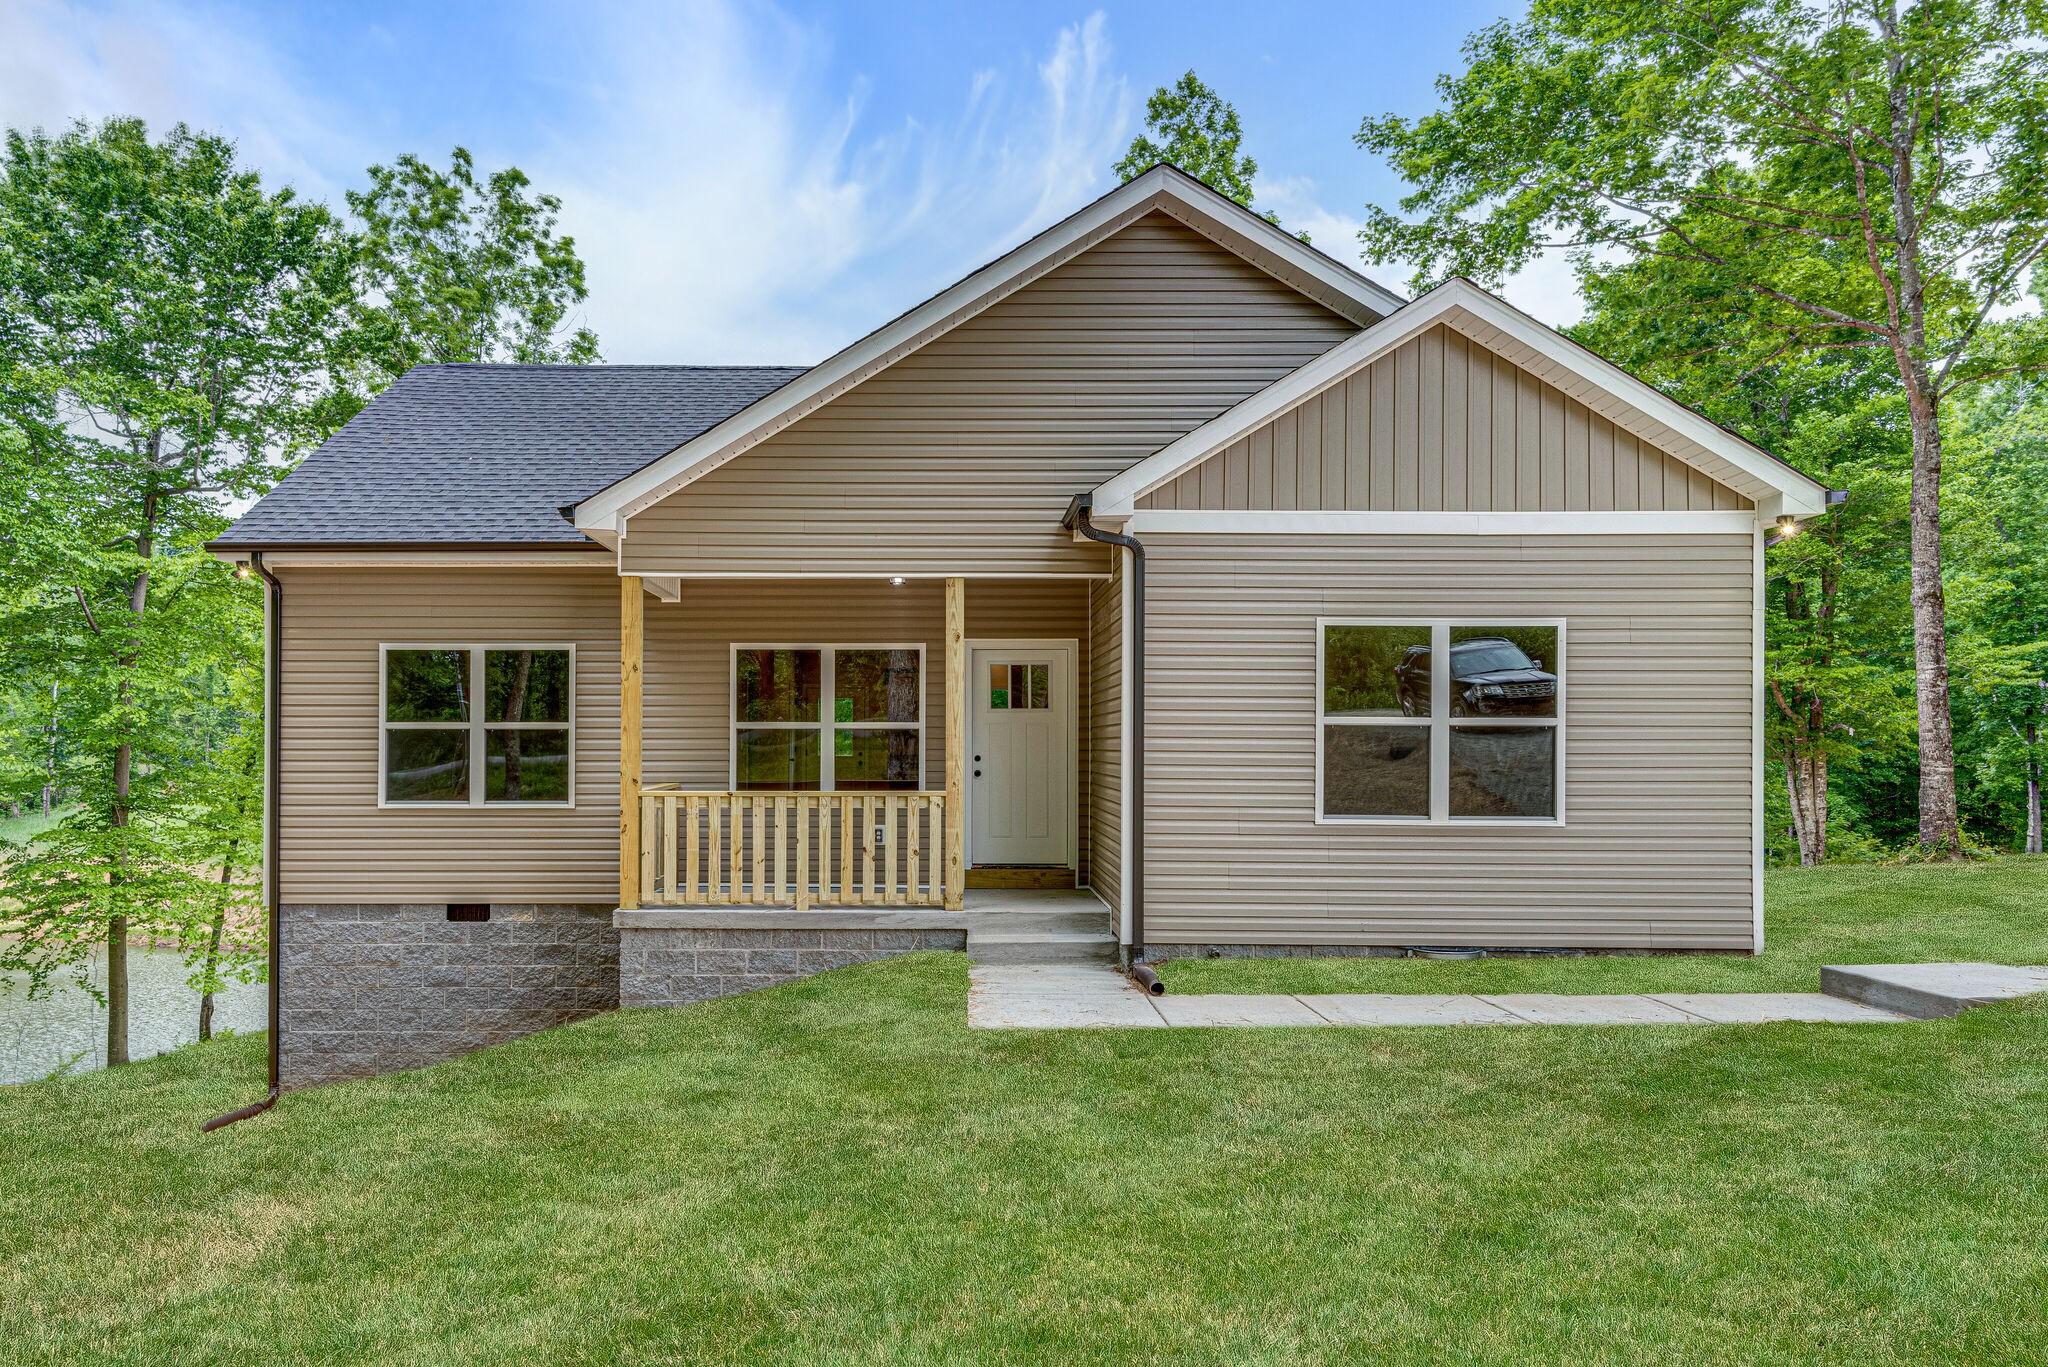 1170 Cowan Rd (Lot 1) Property Photo - Dickson, TN real estate listing